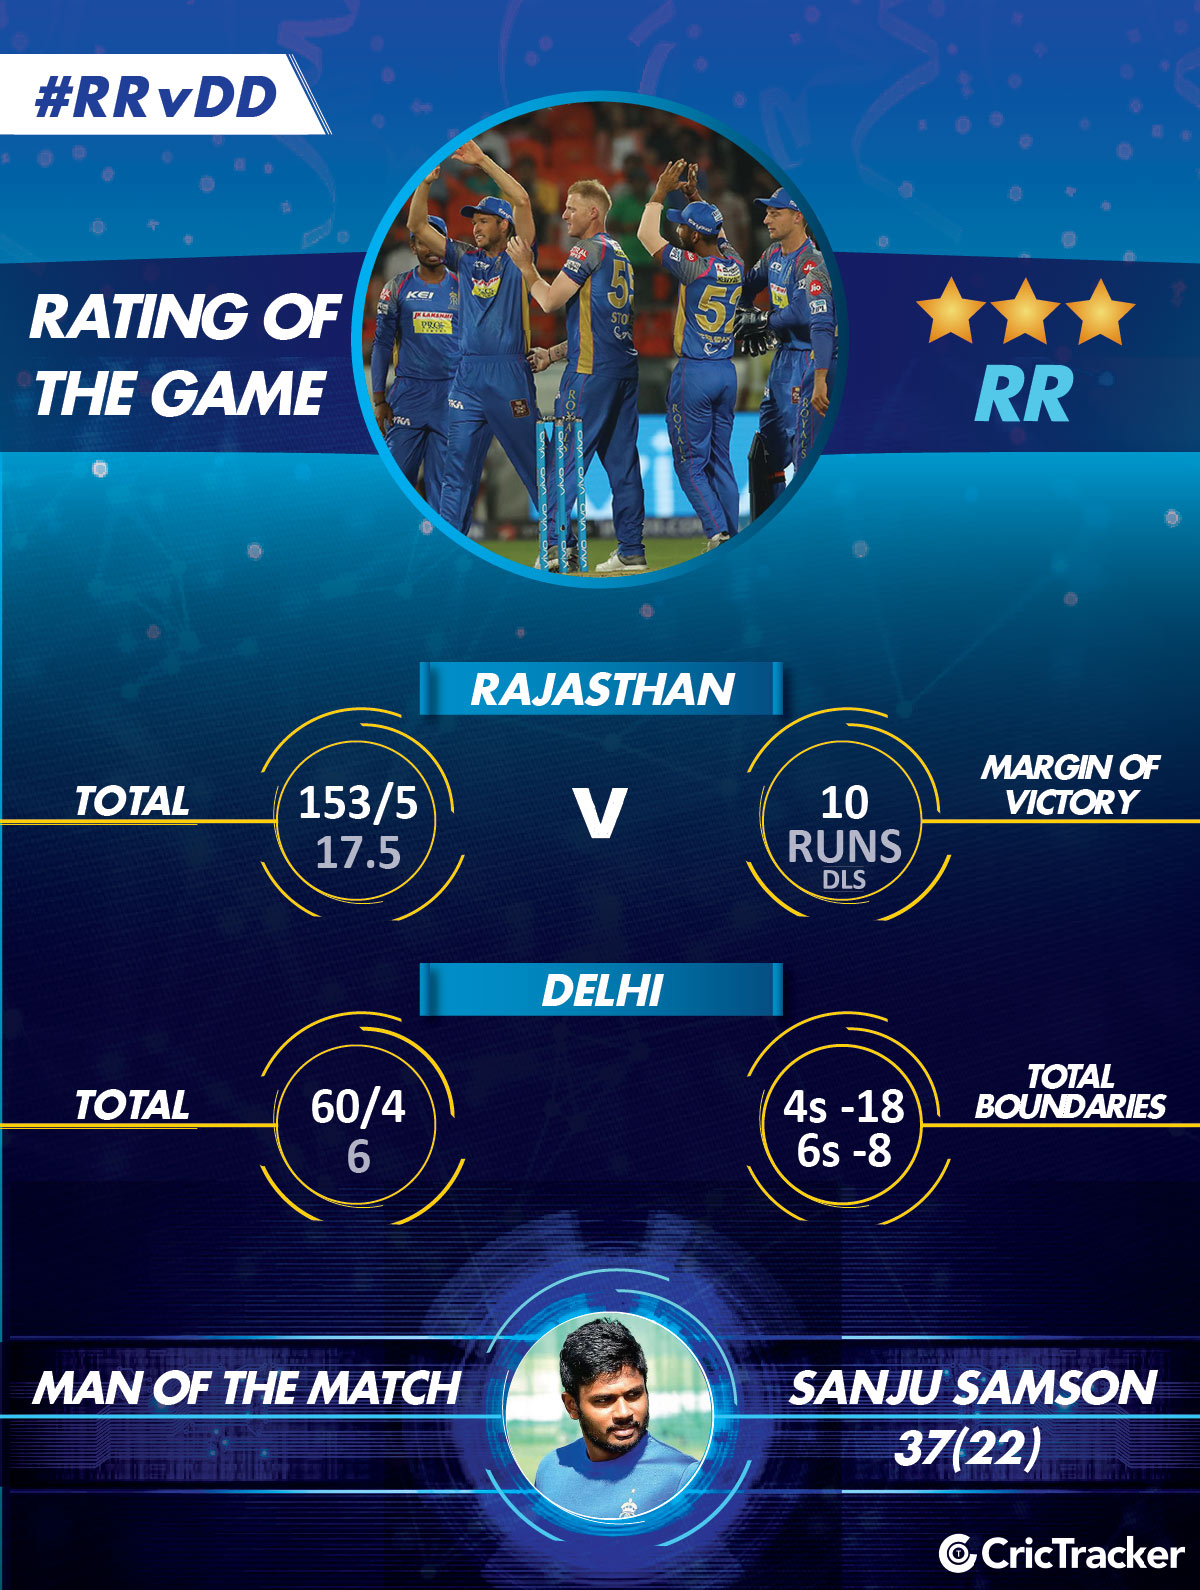 IPL-2018-RAJASTHAN-ROYALS-RATING-IPL-teamoftheday